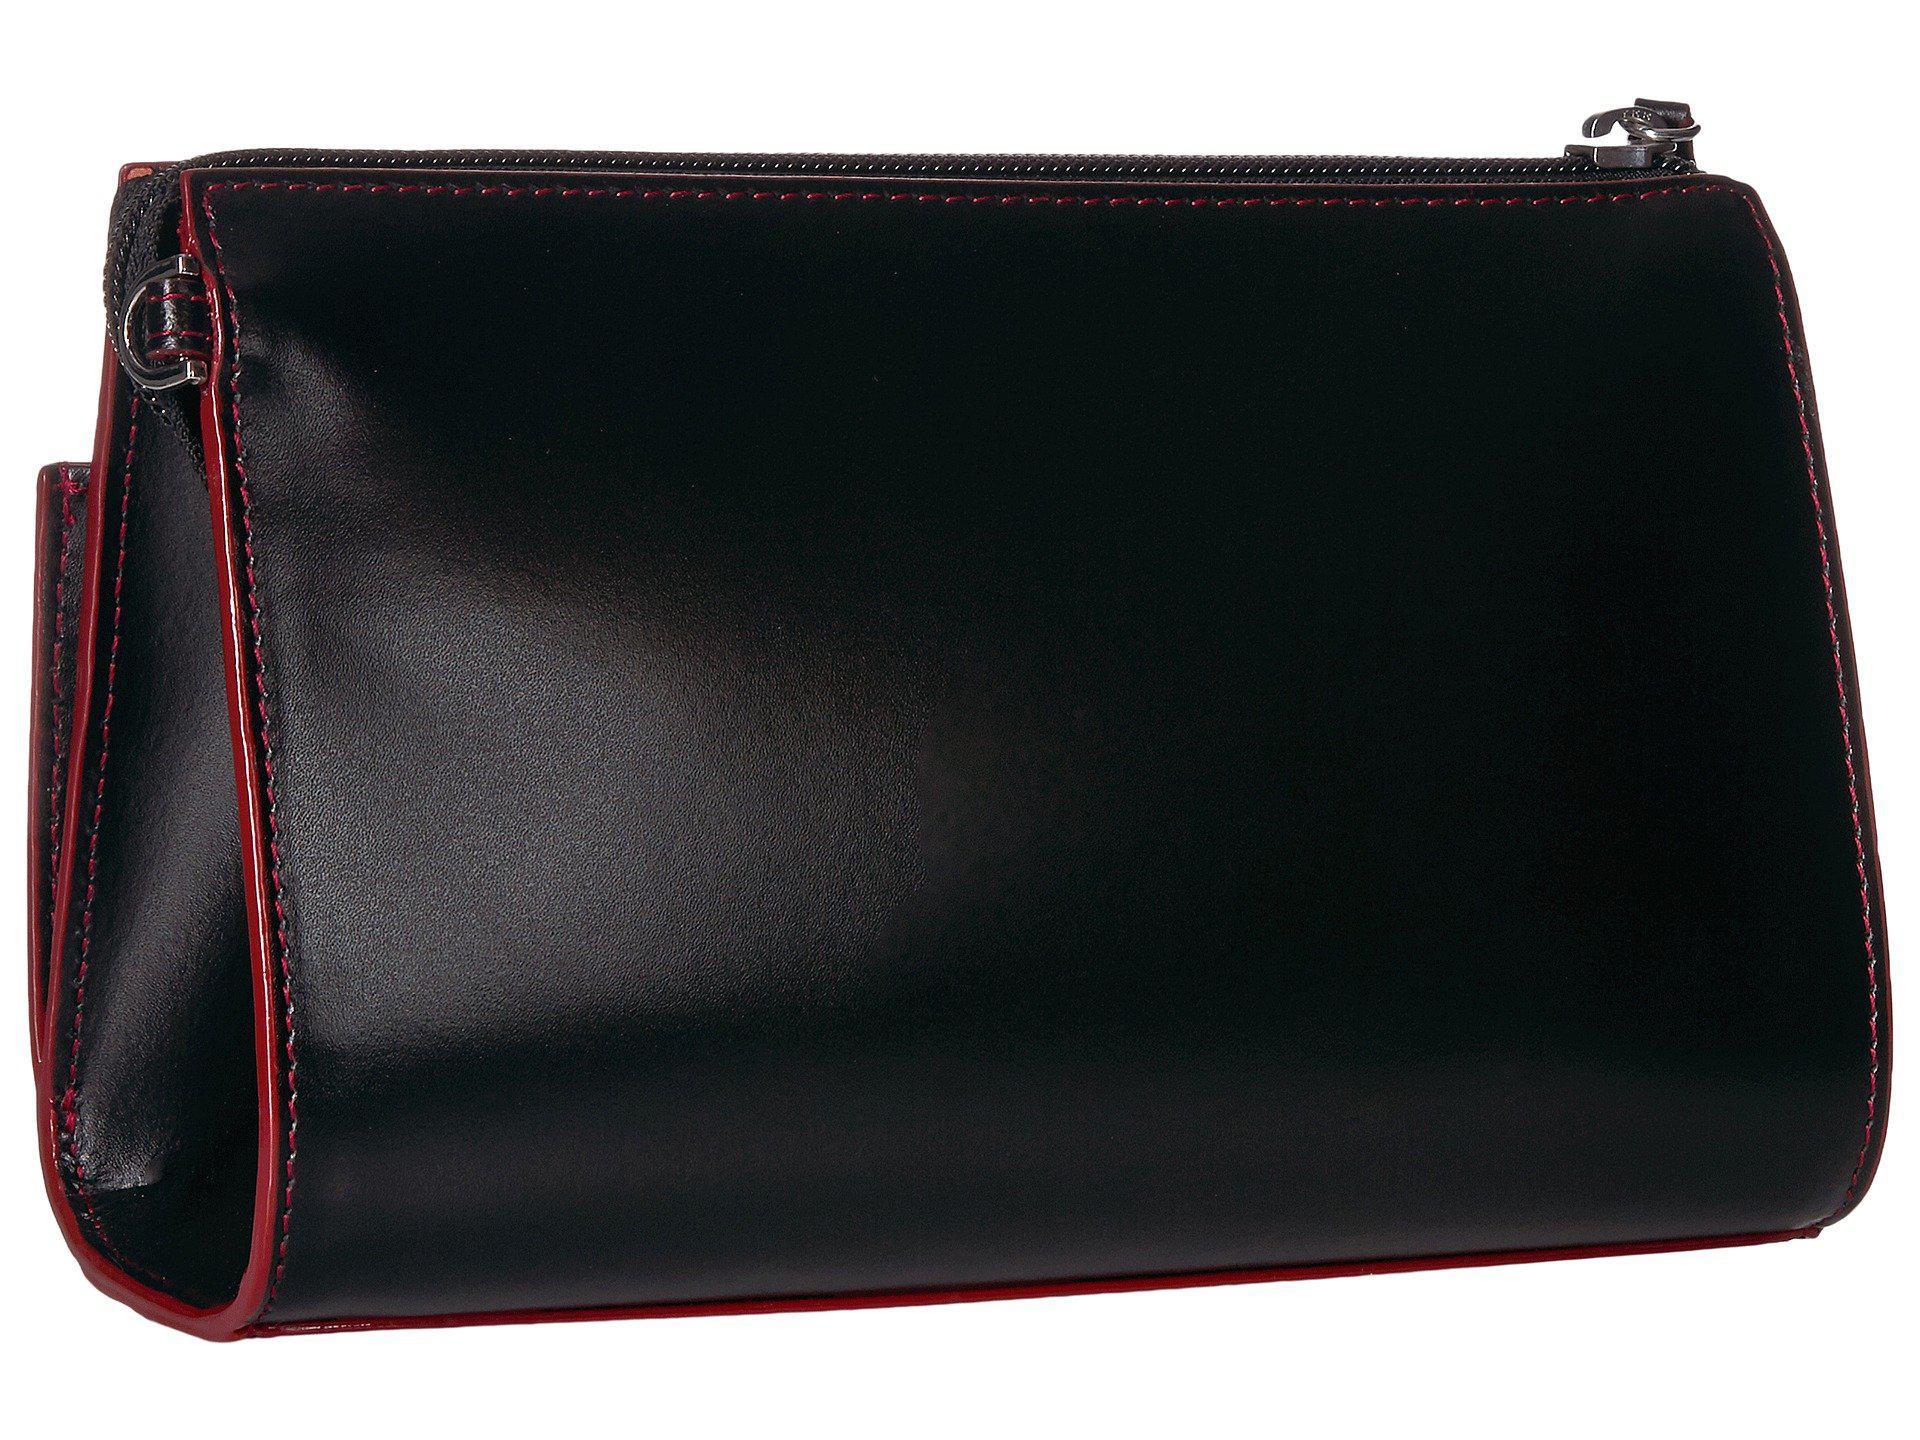 88a07ec33 Lodis - Black Audrey Vicky Convertible Crossbody Clutch - Lyst. View  fullscreen